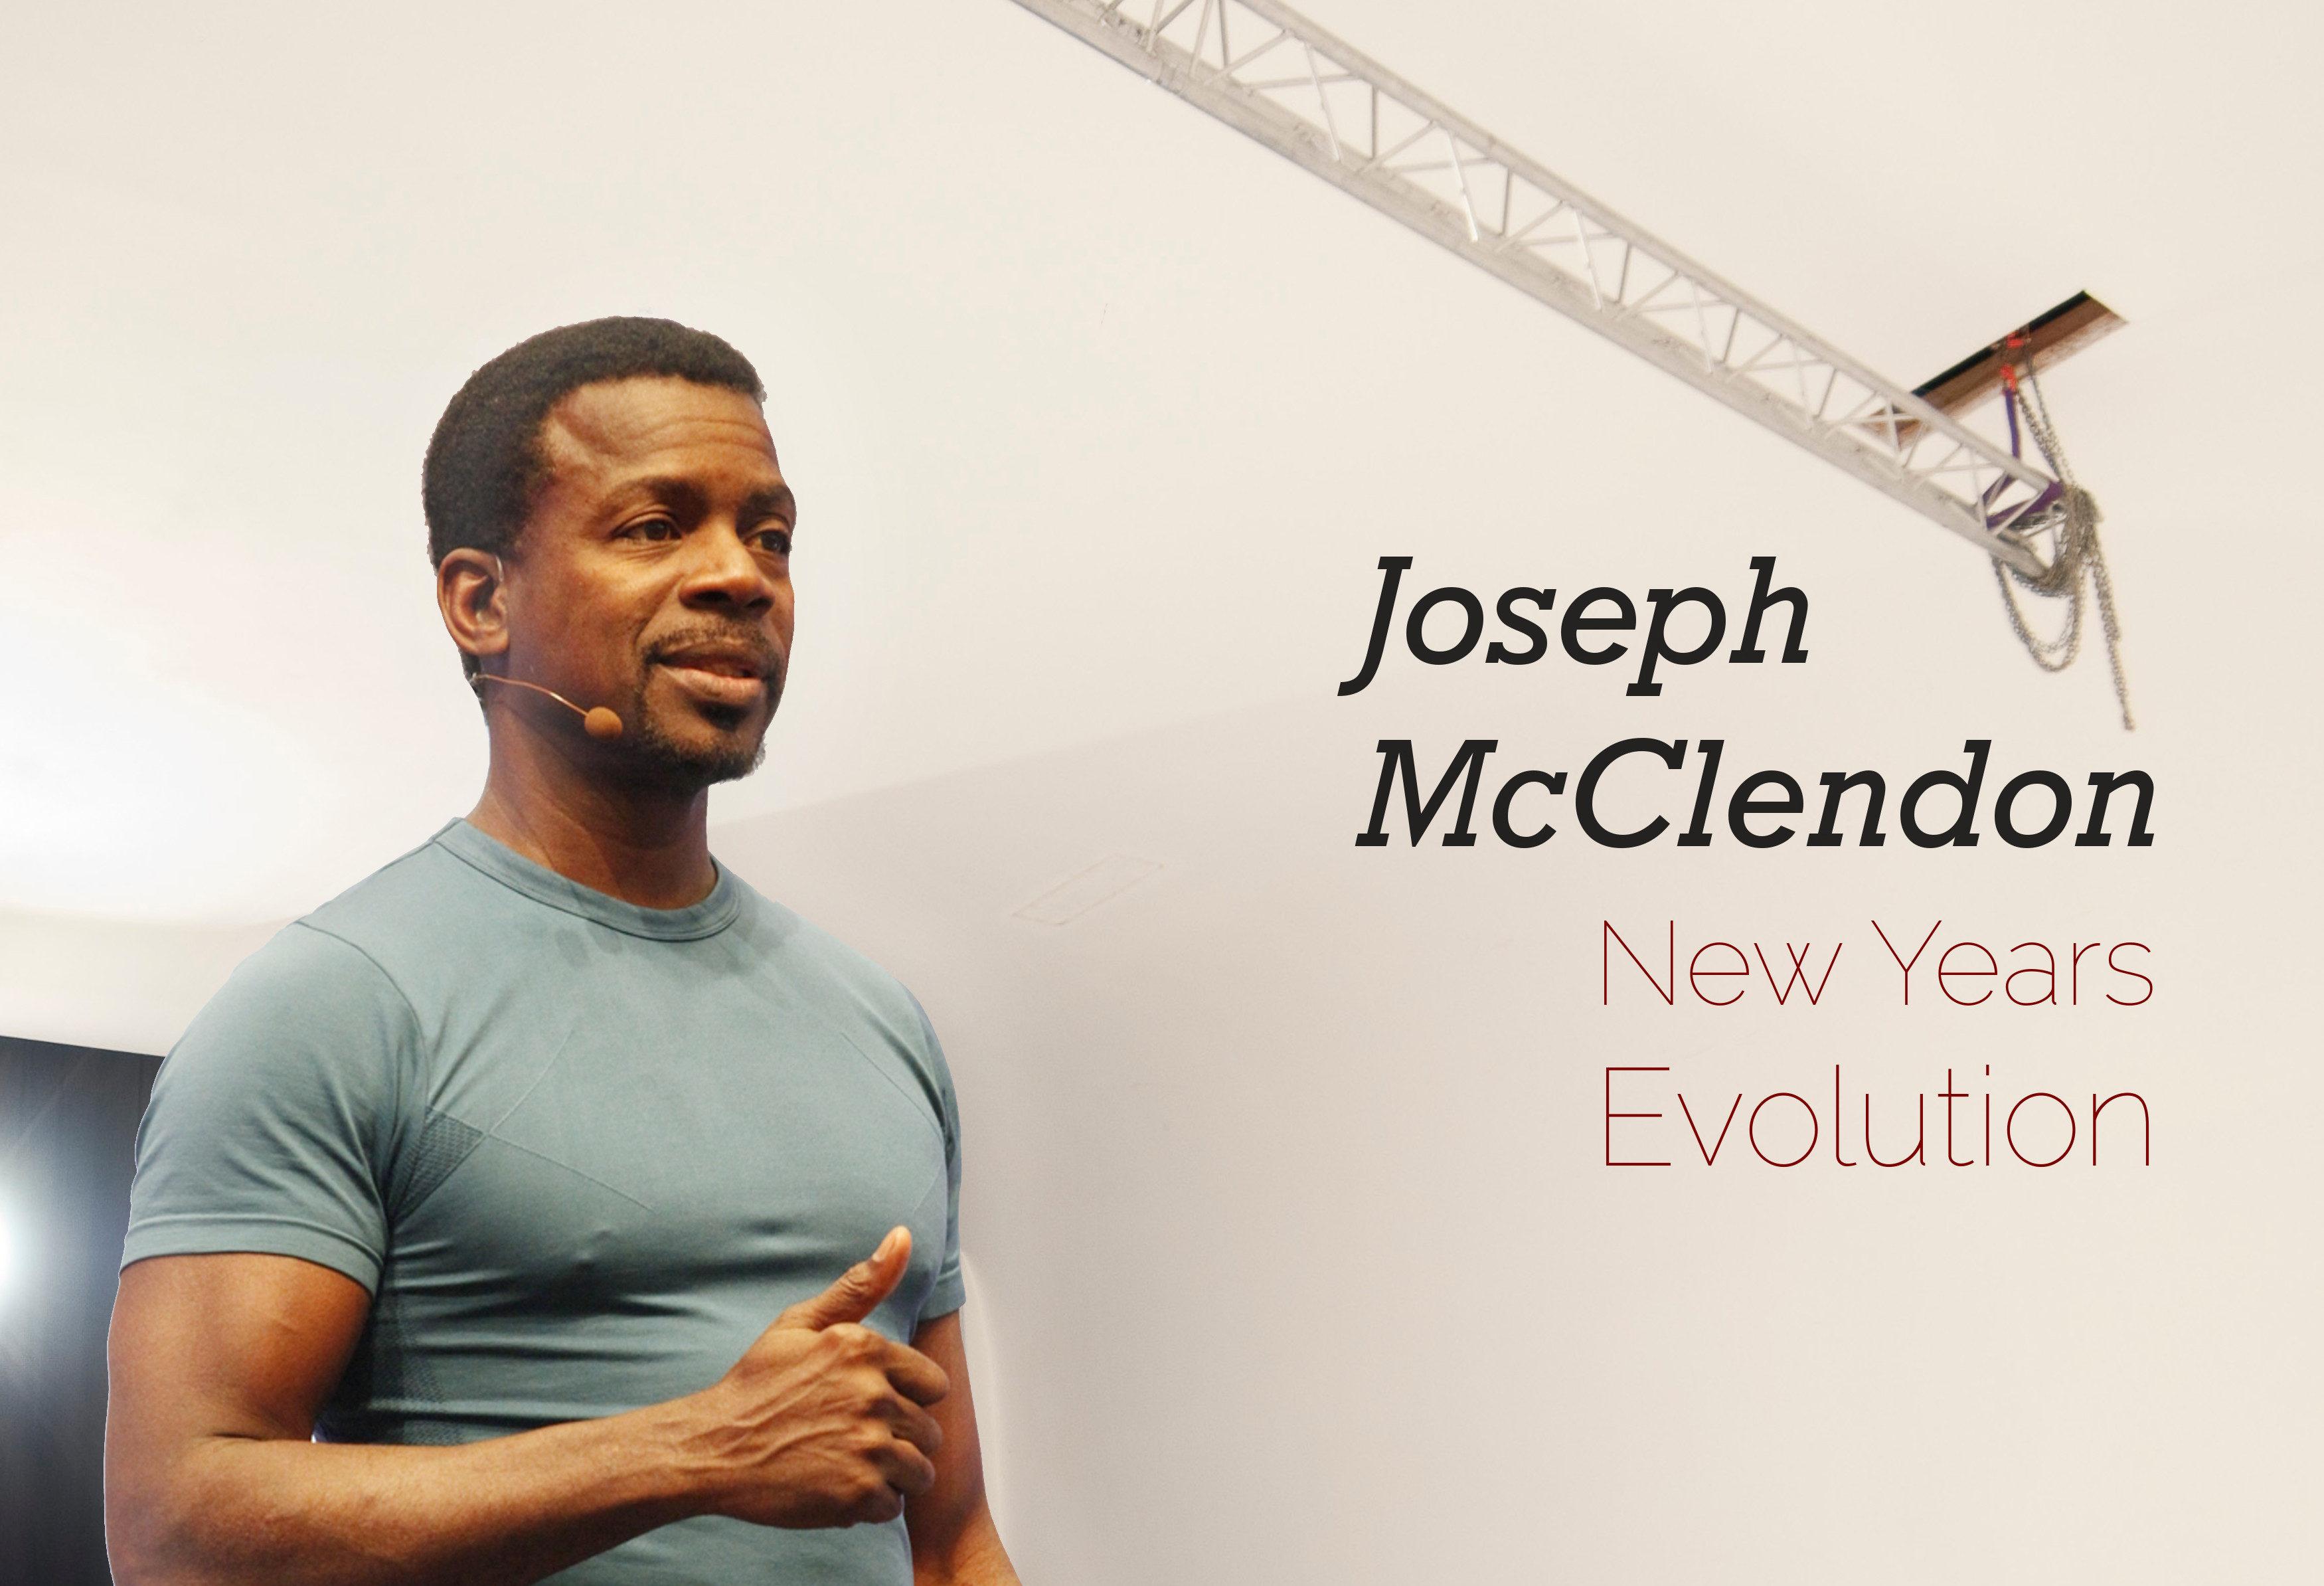 Joseph McClendon E-Book